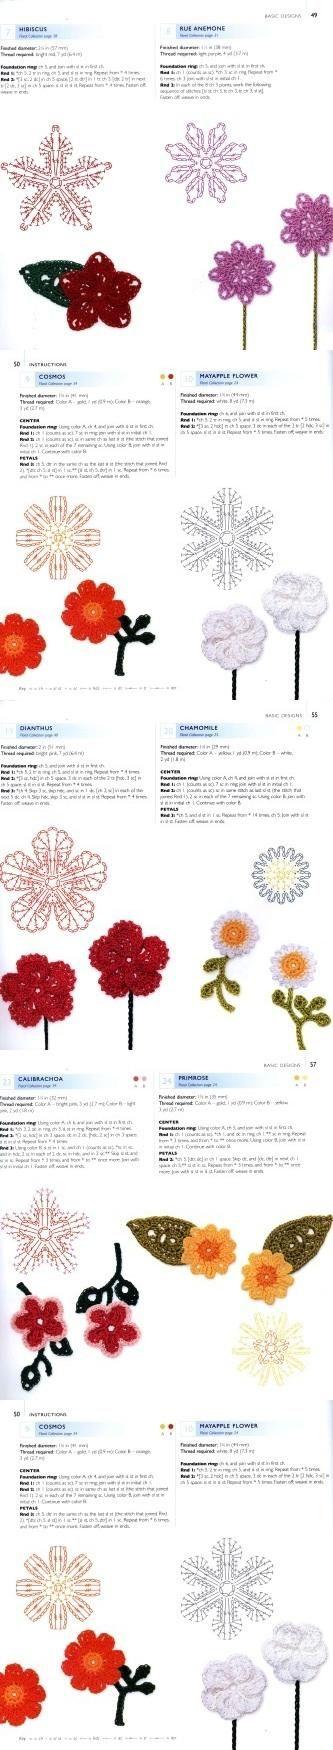 201 best CROCHET FLORES images on Pinterest | Crocheted flowers ...